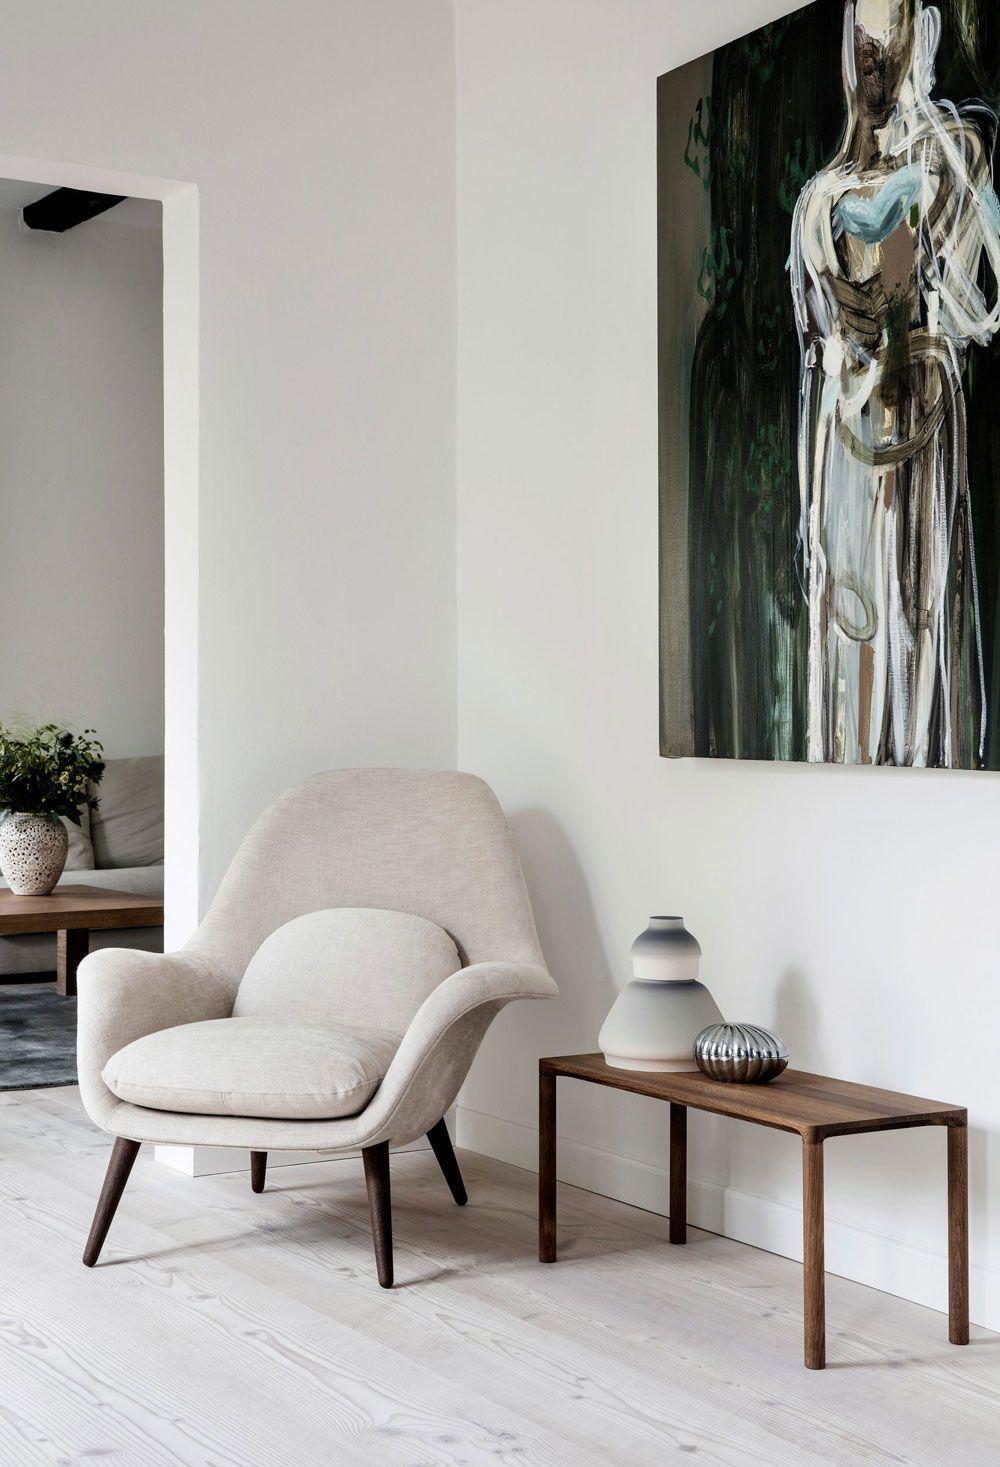 Star wars home decor ideas beautiful pinterest interior design and monochrome bedroom also rh